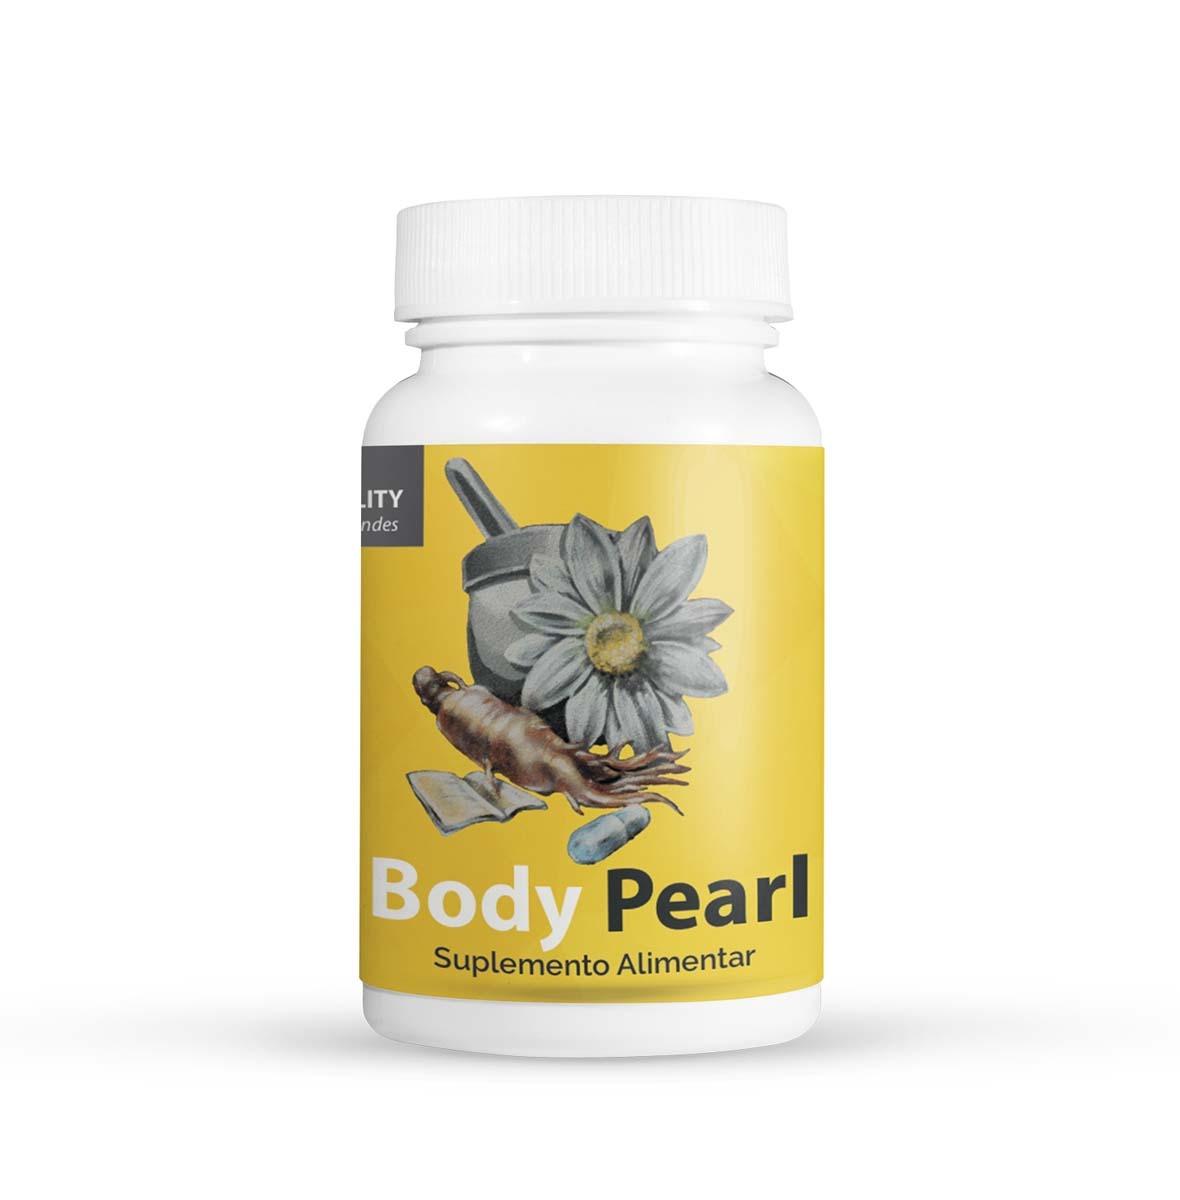 Body Pearl